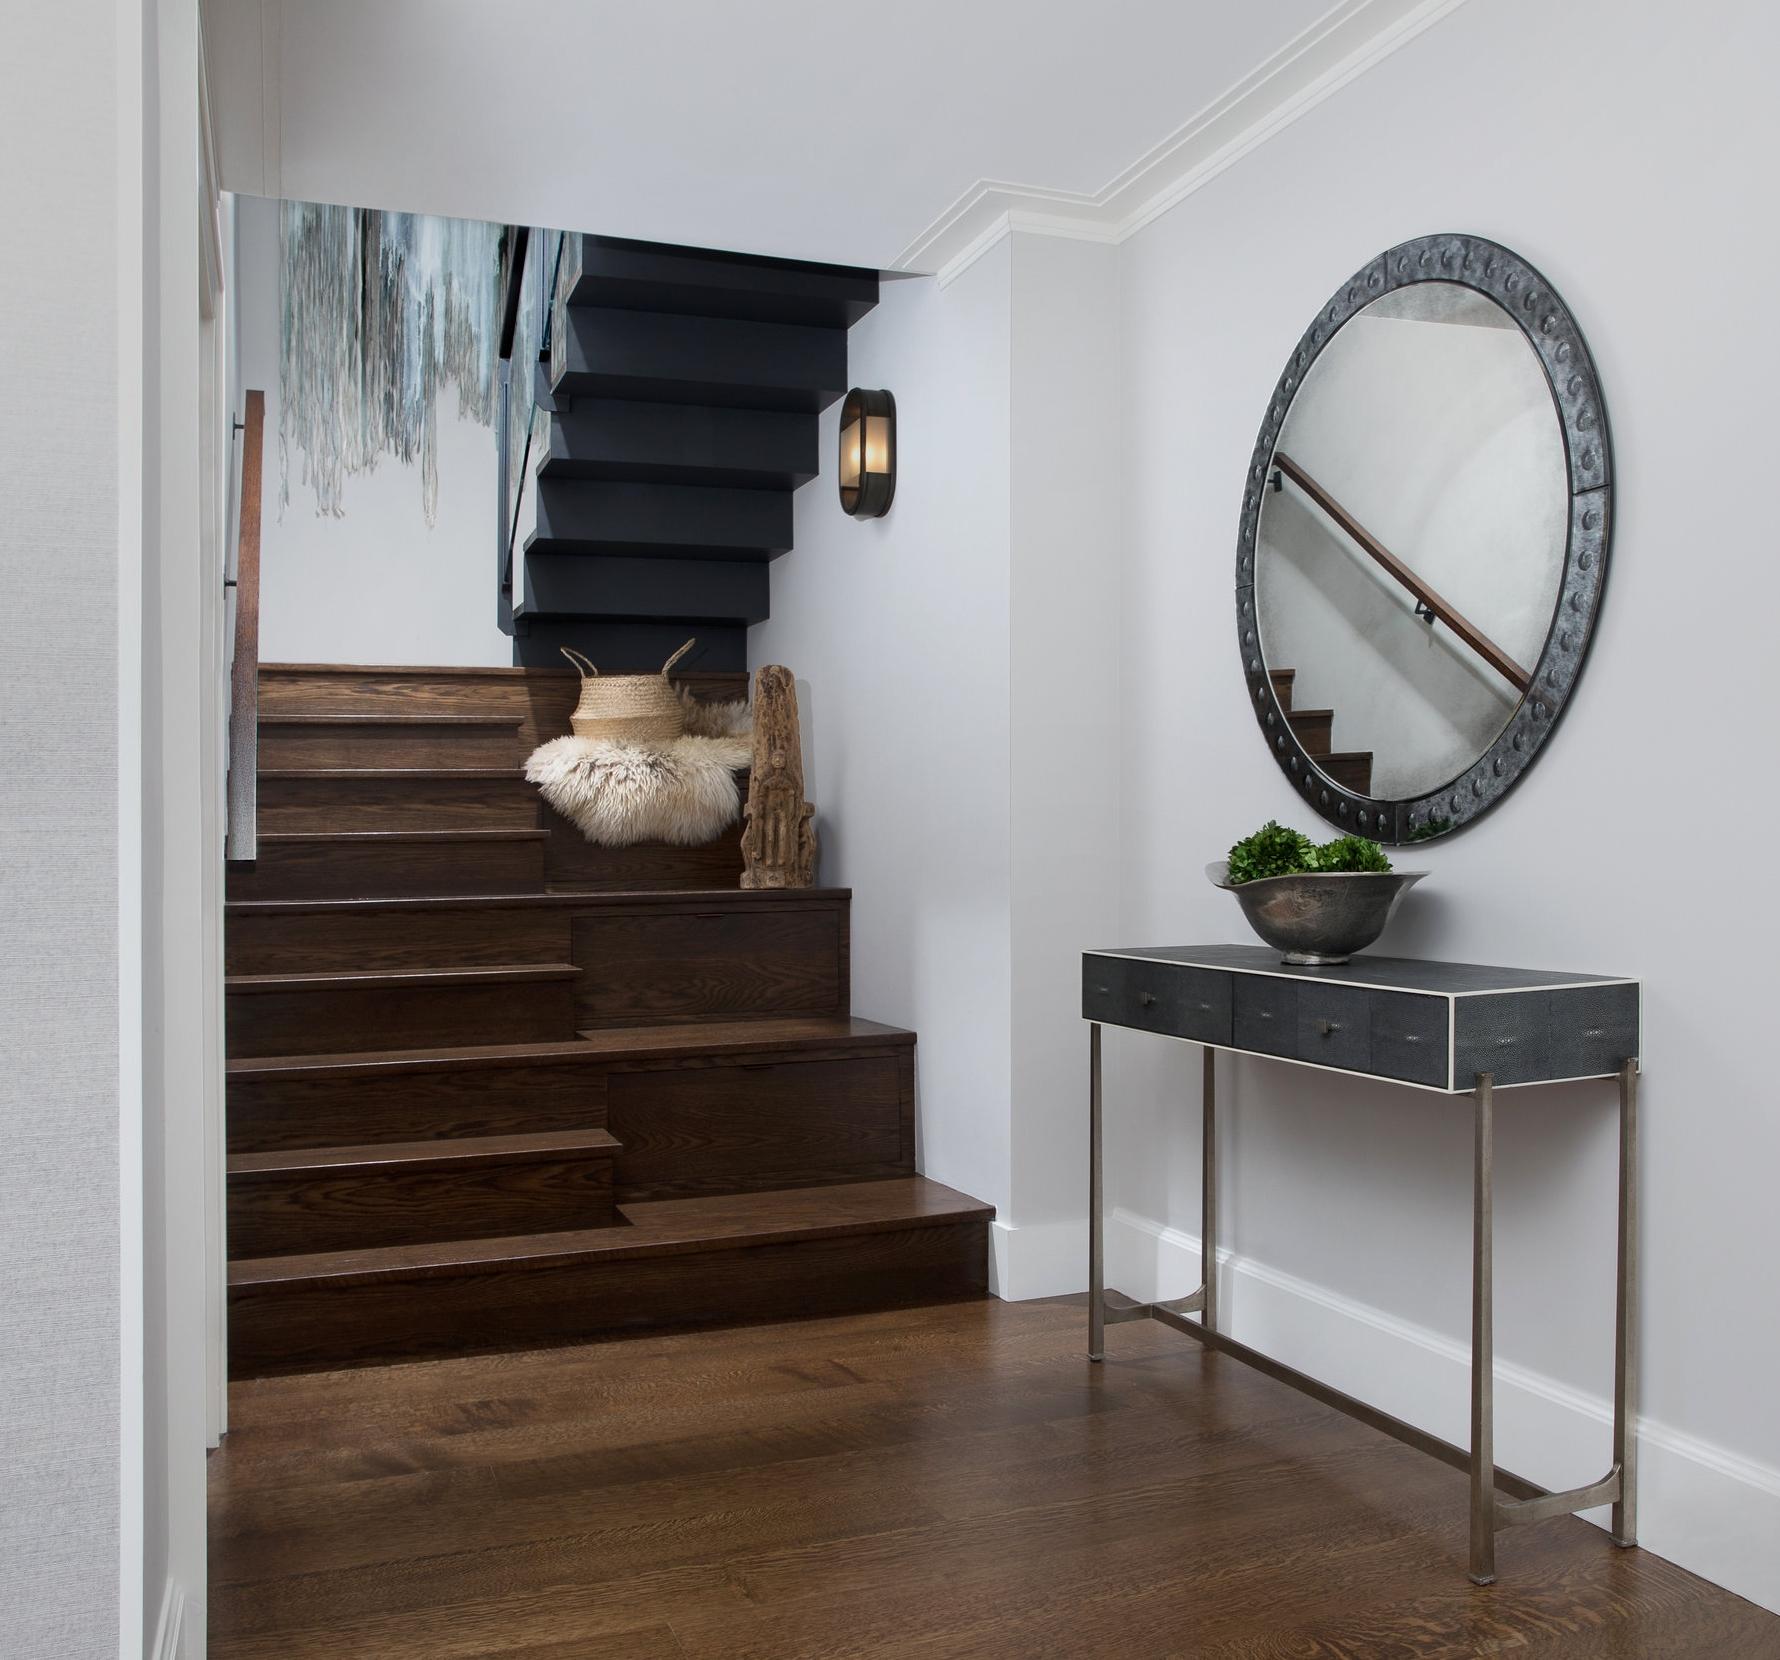 115-duplex-apartment-renovation-staircase